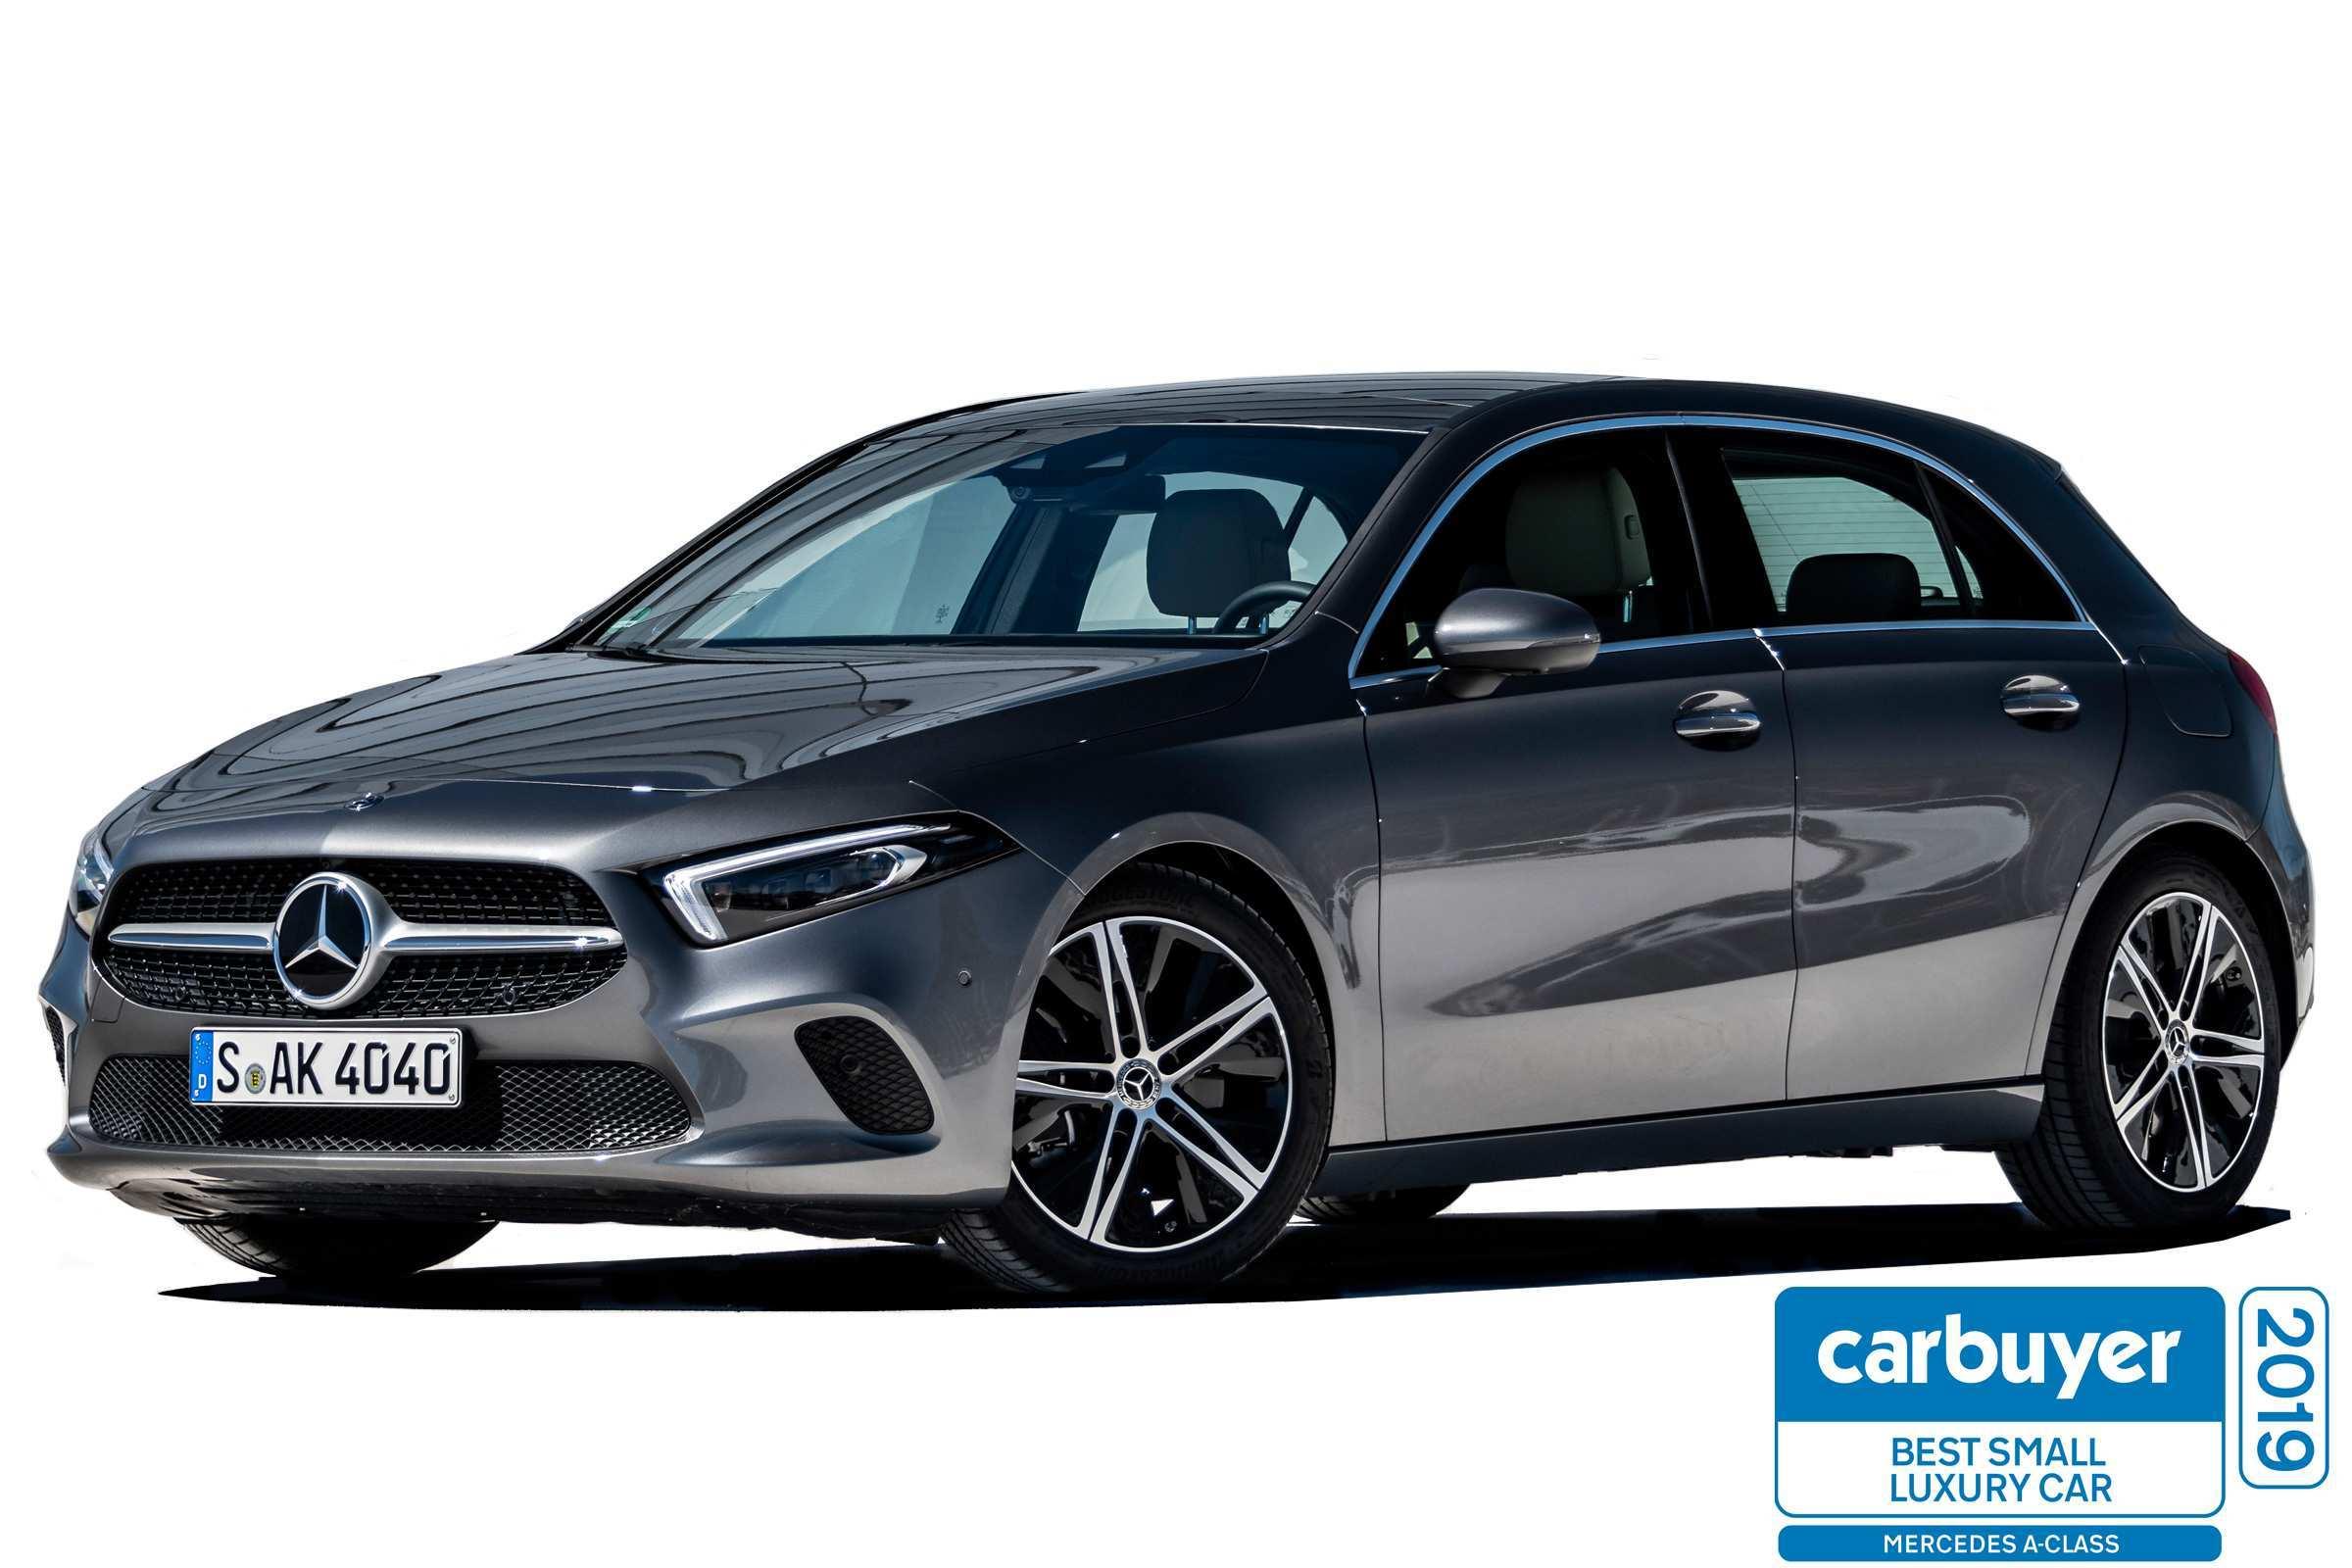 56 All New Best Mercedes Benz B Klasse 2019 Interior Exterior And Review Reviews for Best Mercedes Benz B Klasse 2019 Interior Exterior And Review